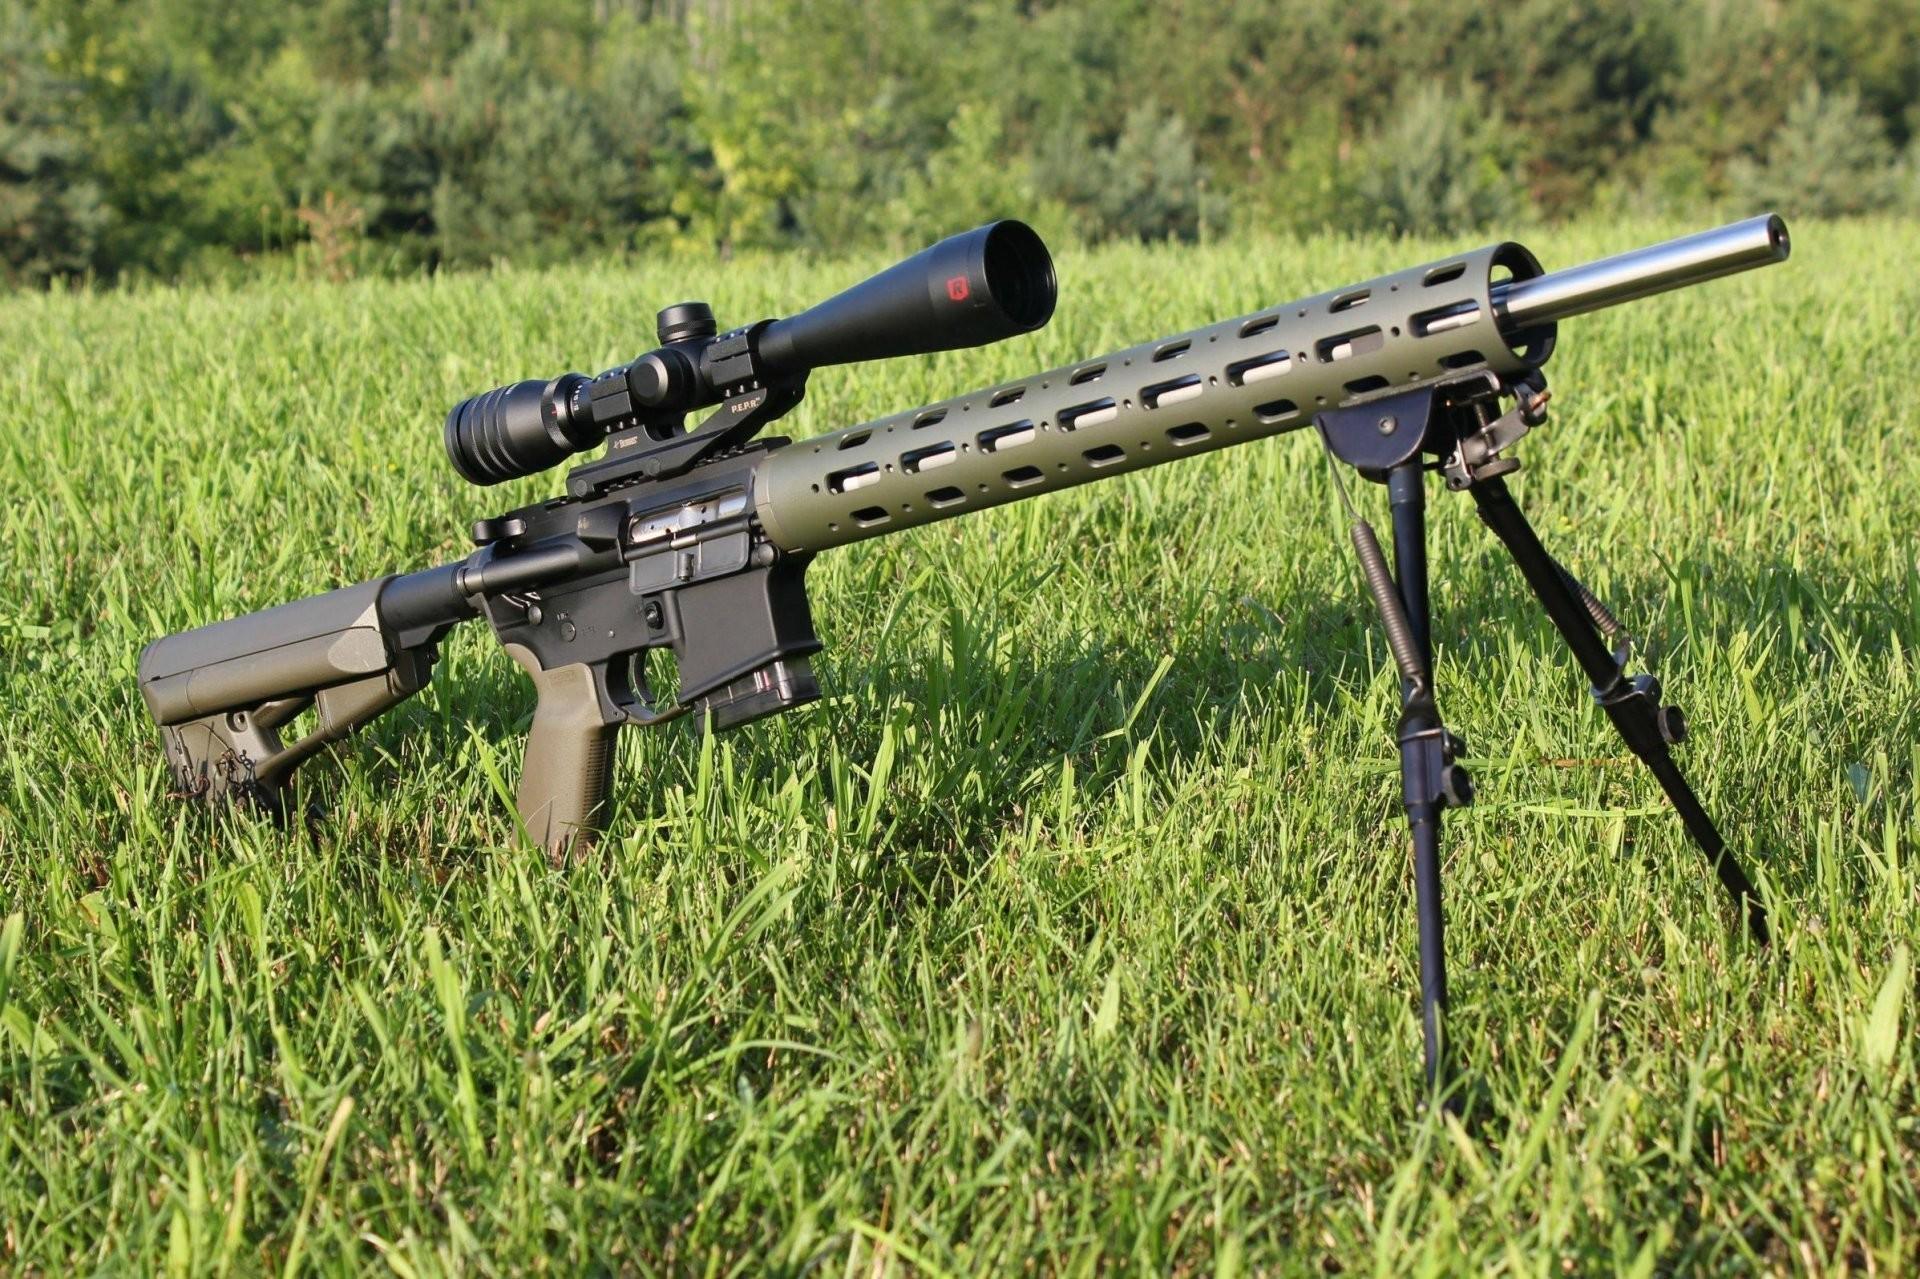 varmint ar-15 modification sniper variant optics fry grass